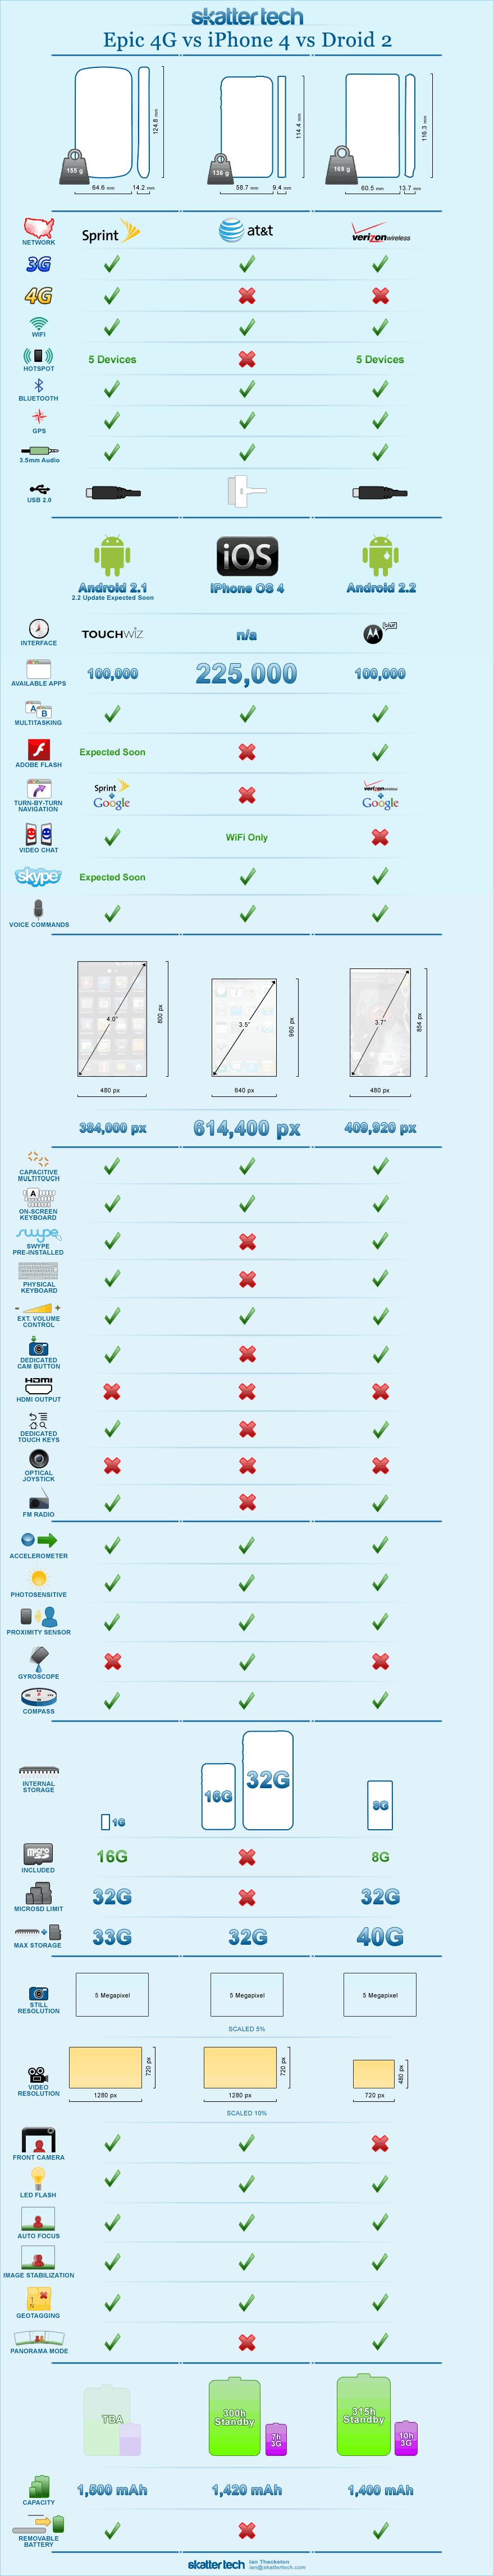 epic-4g-vs-iphone-4-vs-droid-2